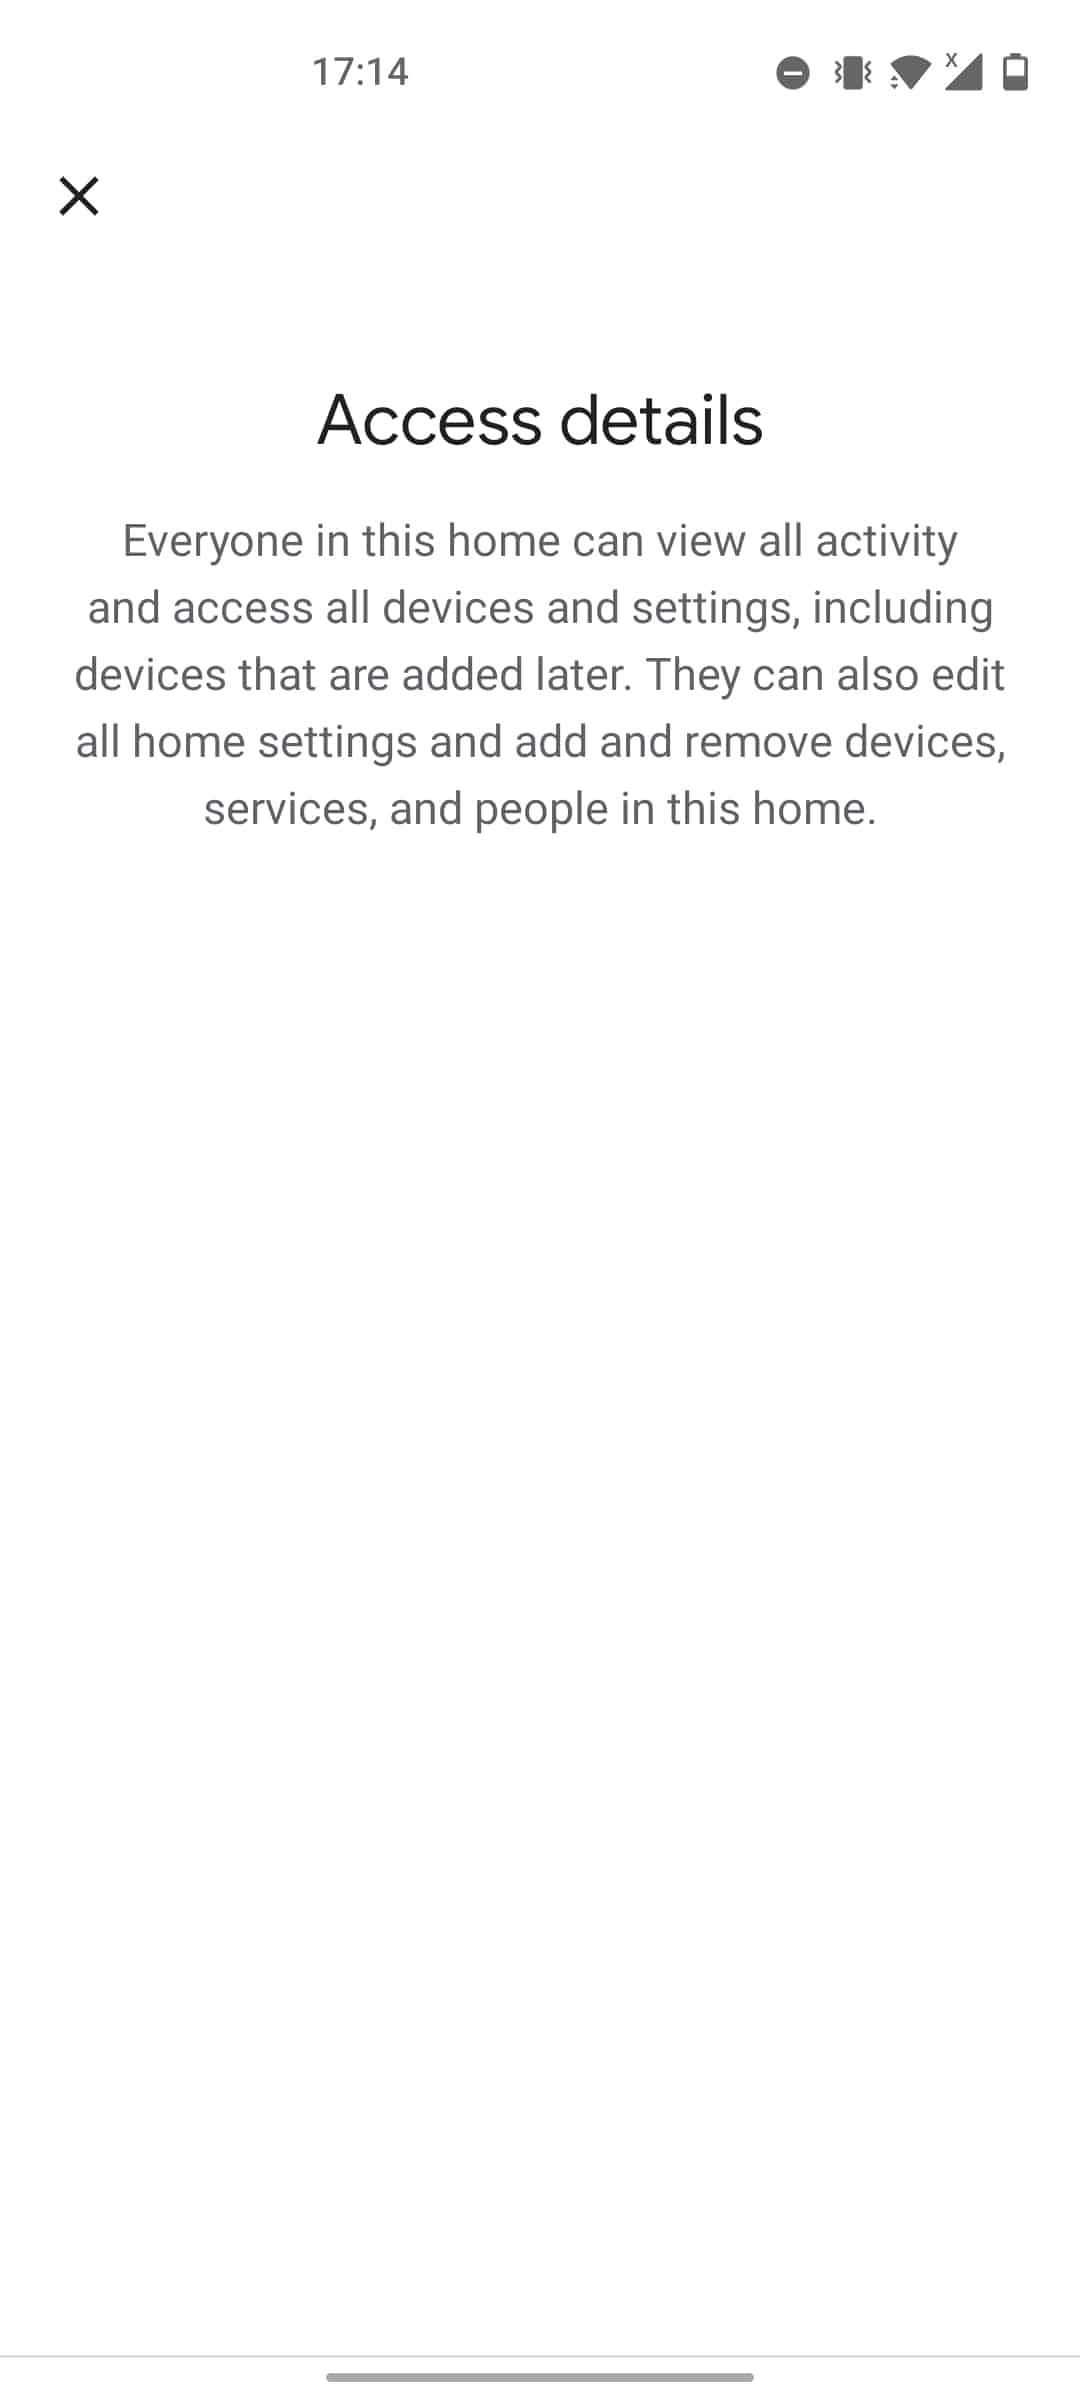 google home app access details